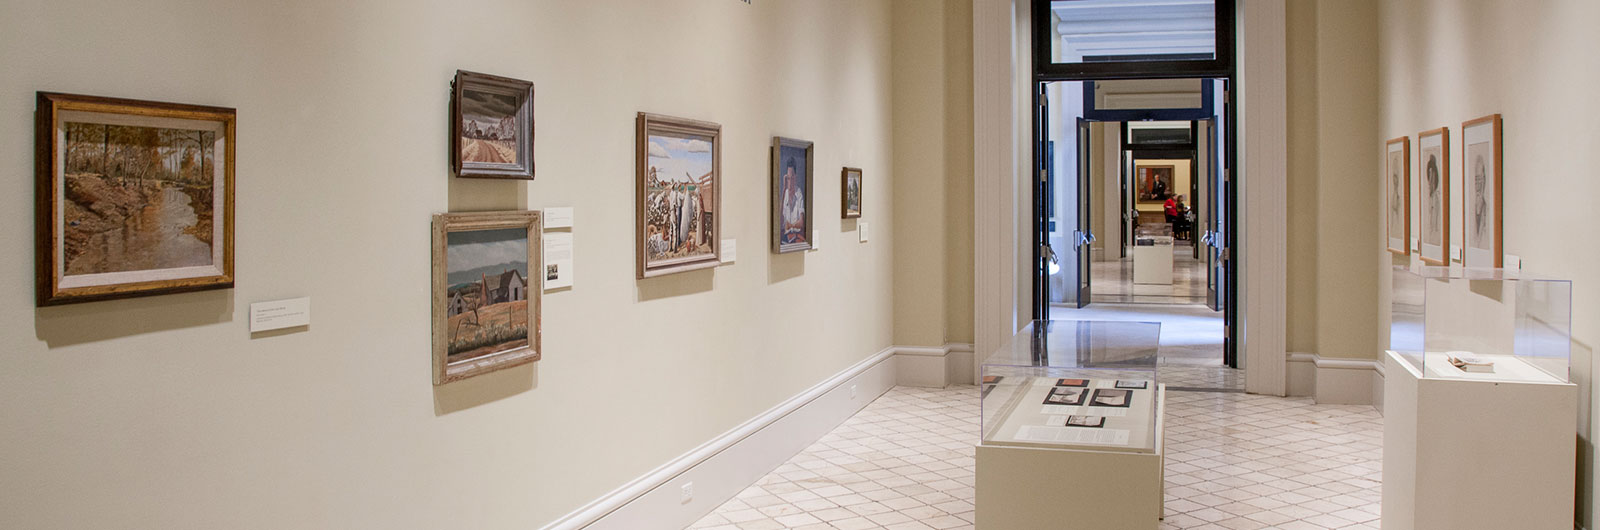 University Art Collection, Meadows Museum